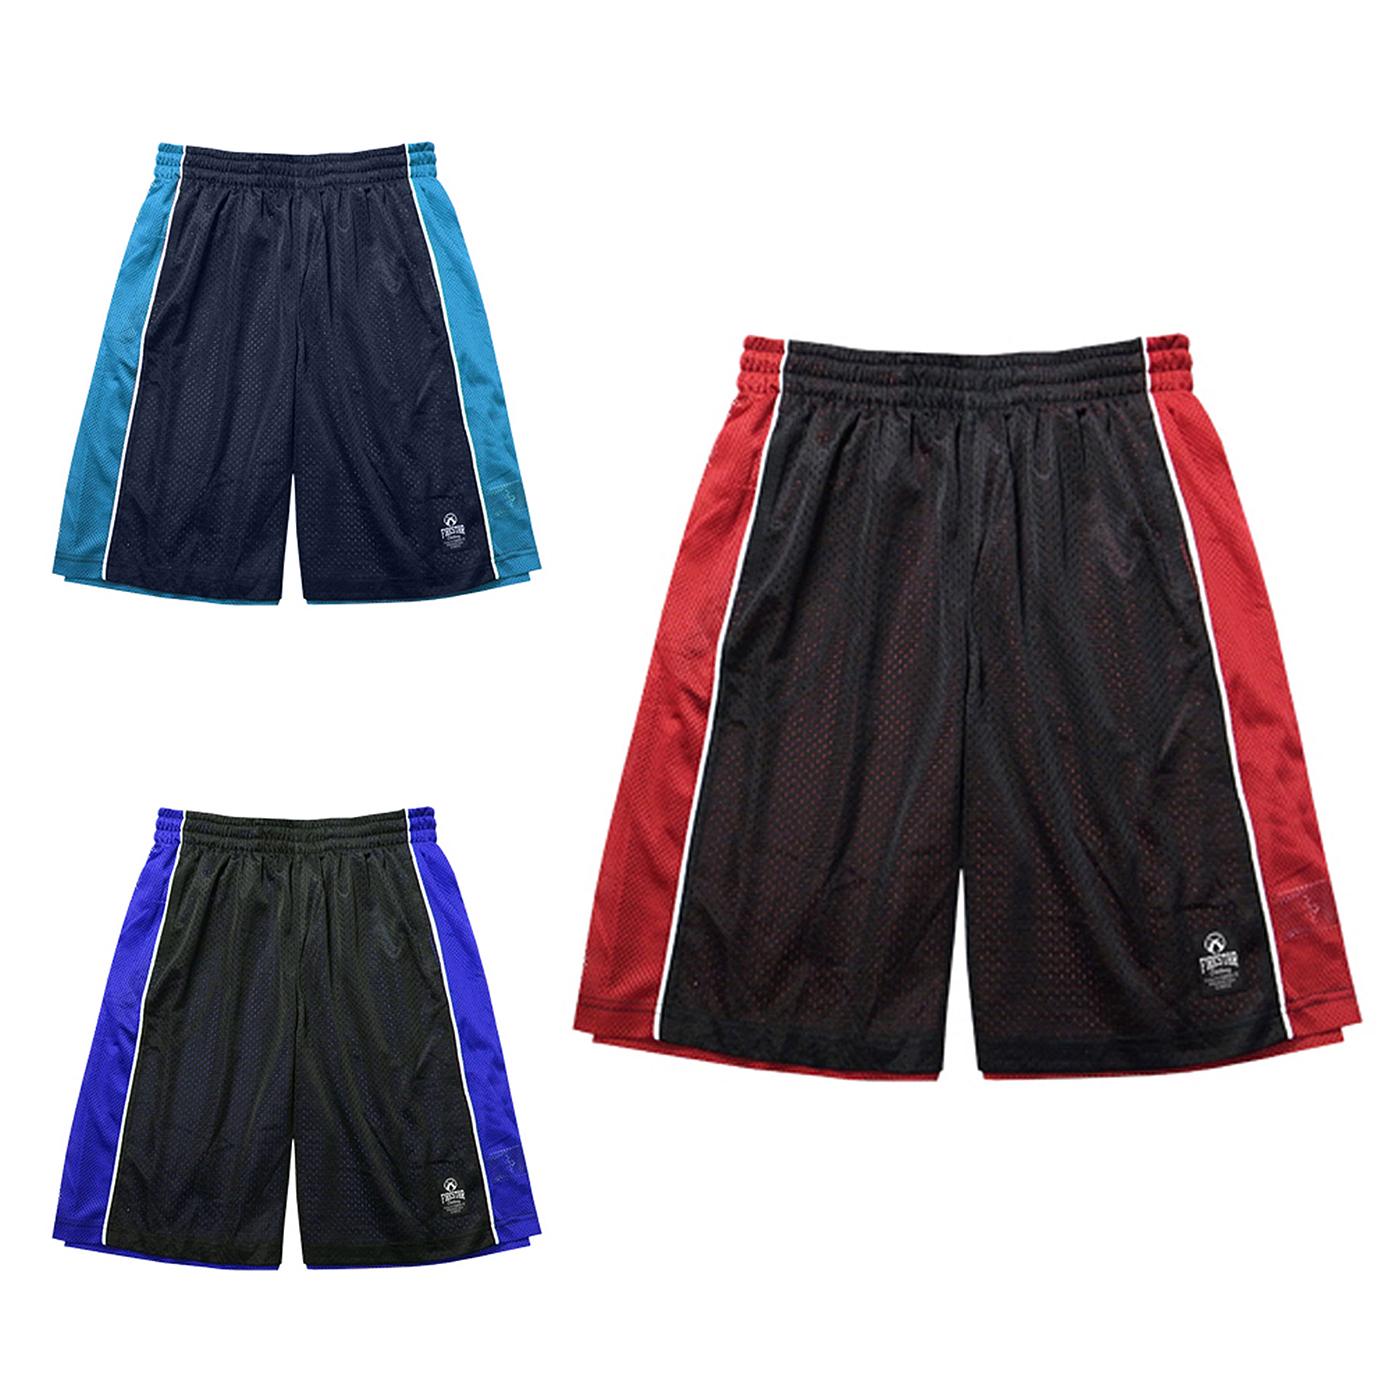 FIRESTAR 籃球褲 B3702-10